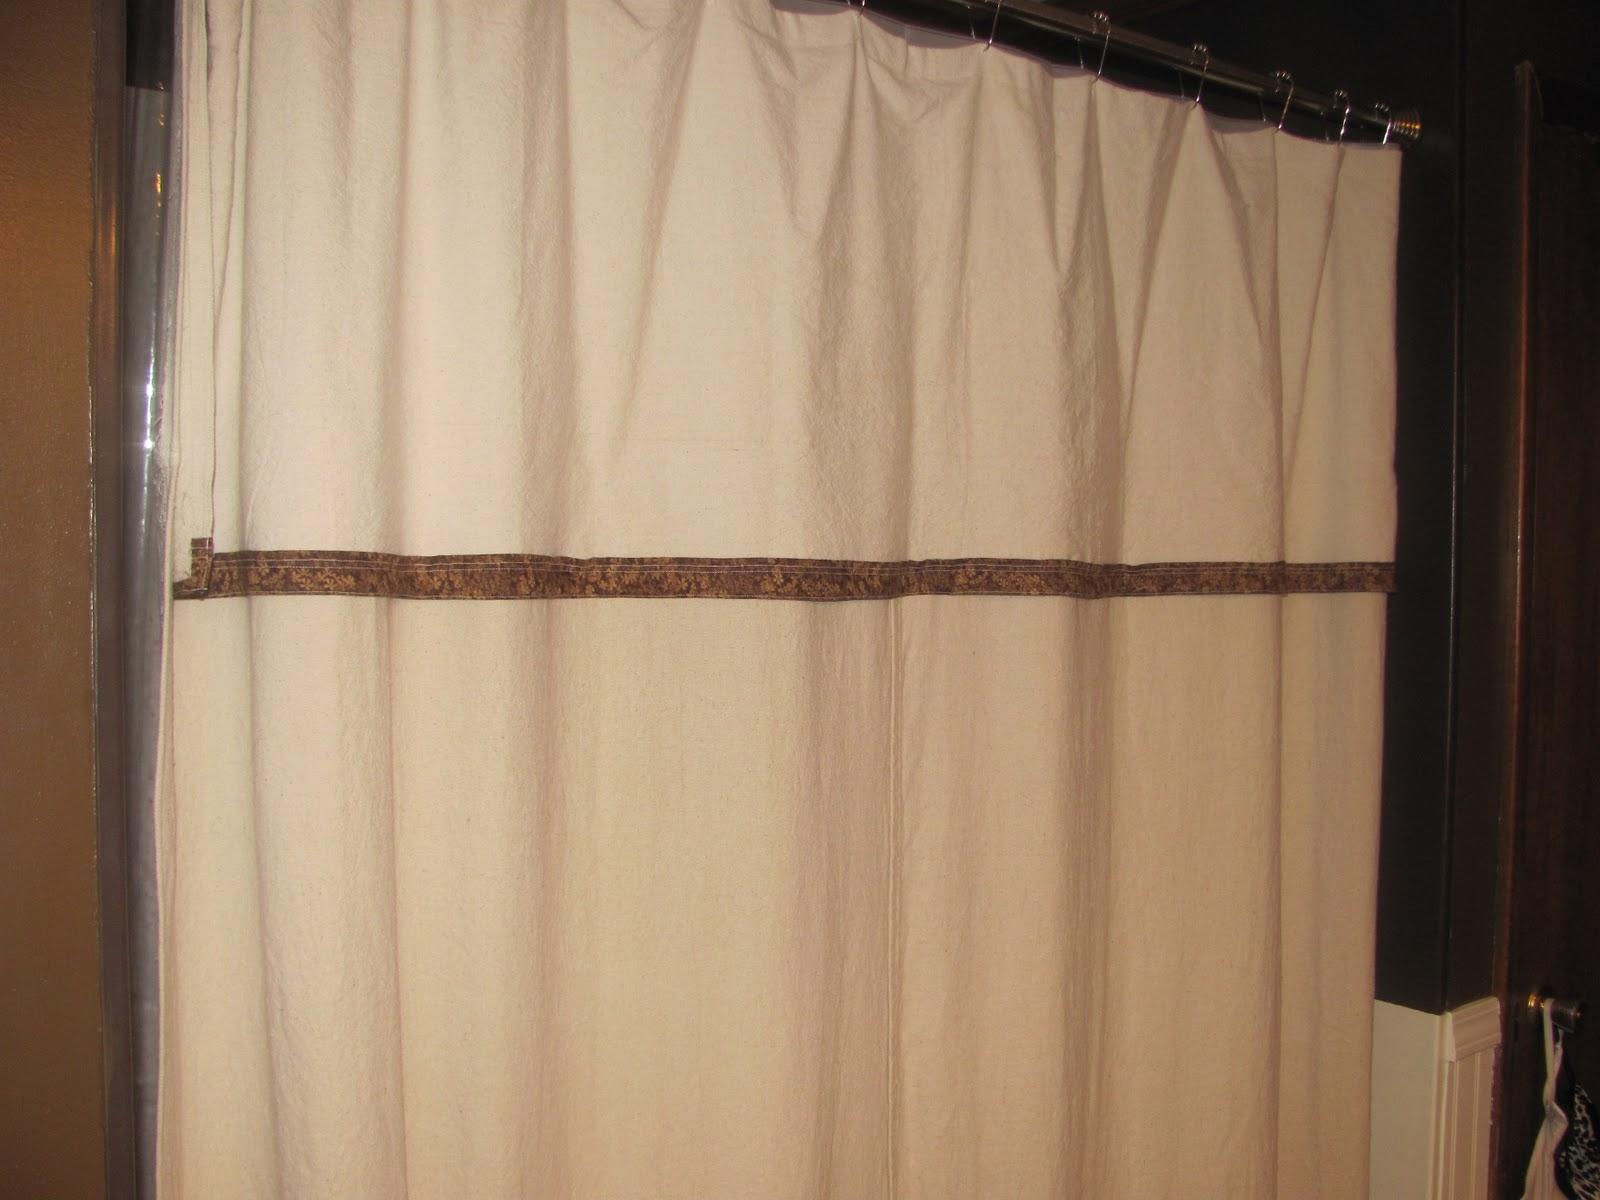 Inspiring Creativeness Drop Cloth Shower Curtain